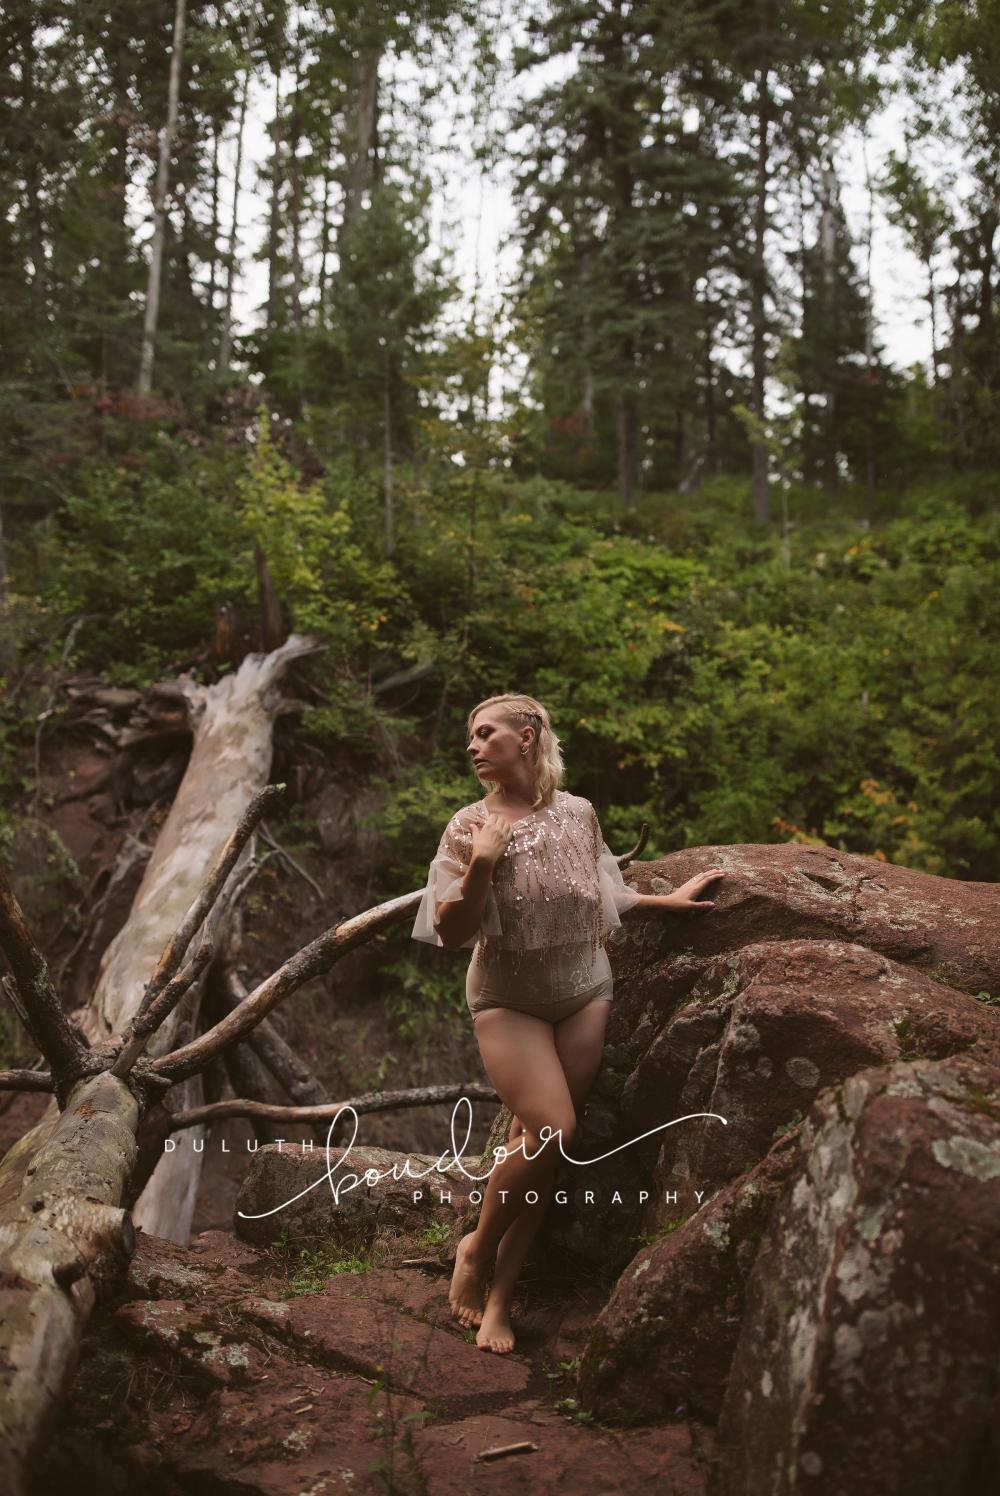 duluth-boudoir-photography-andrea-49